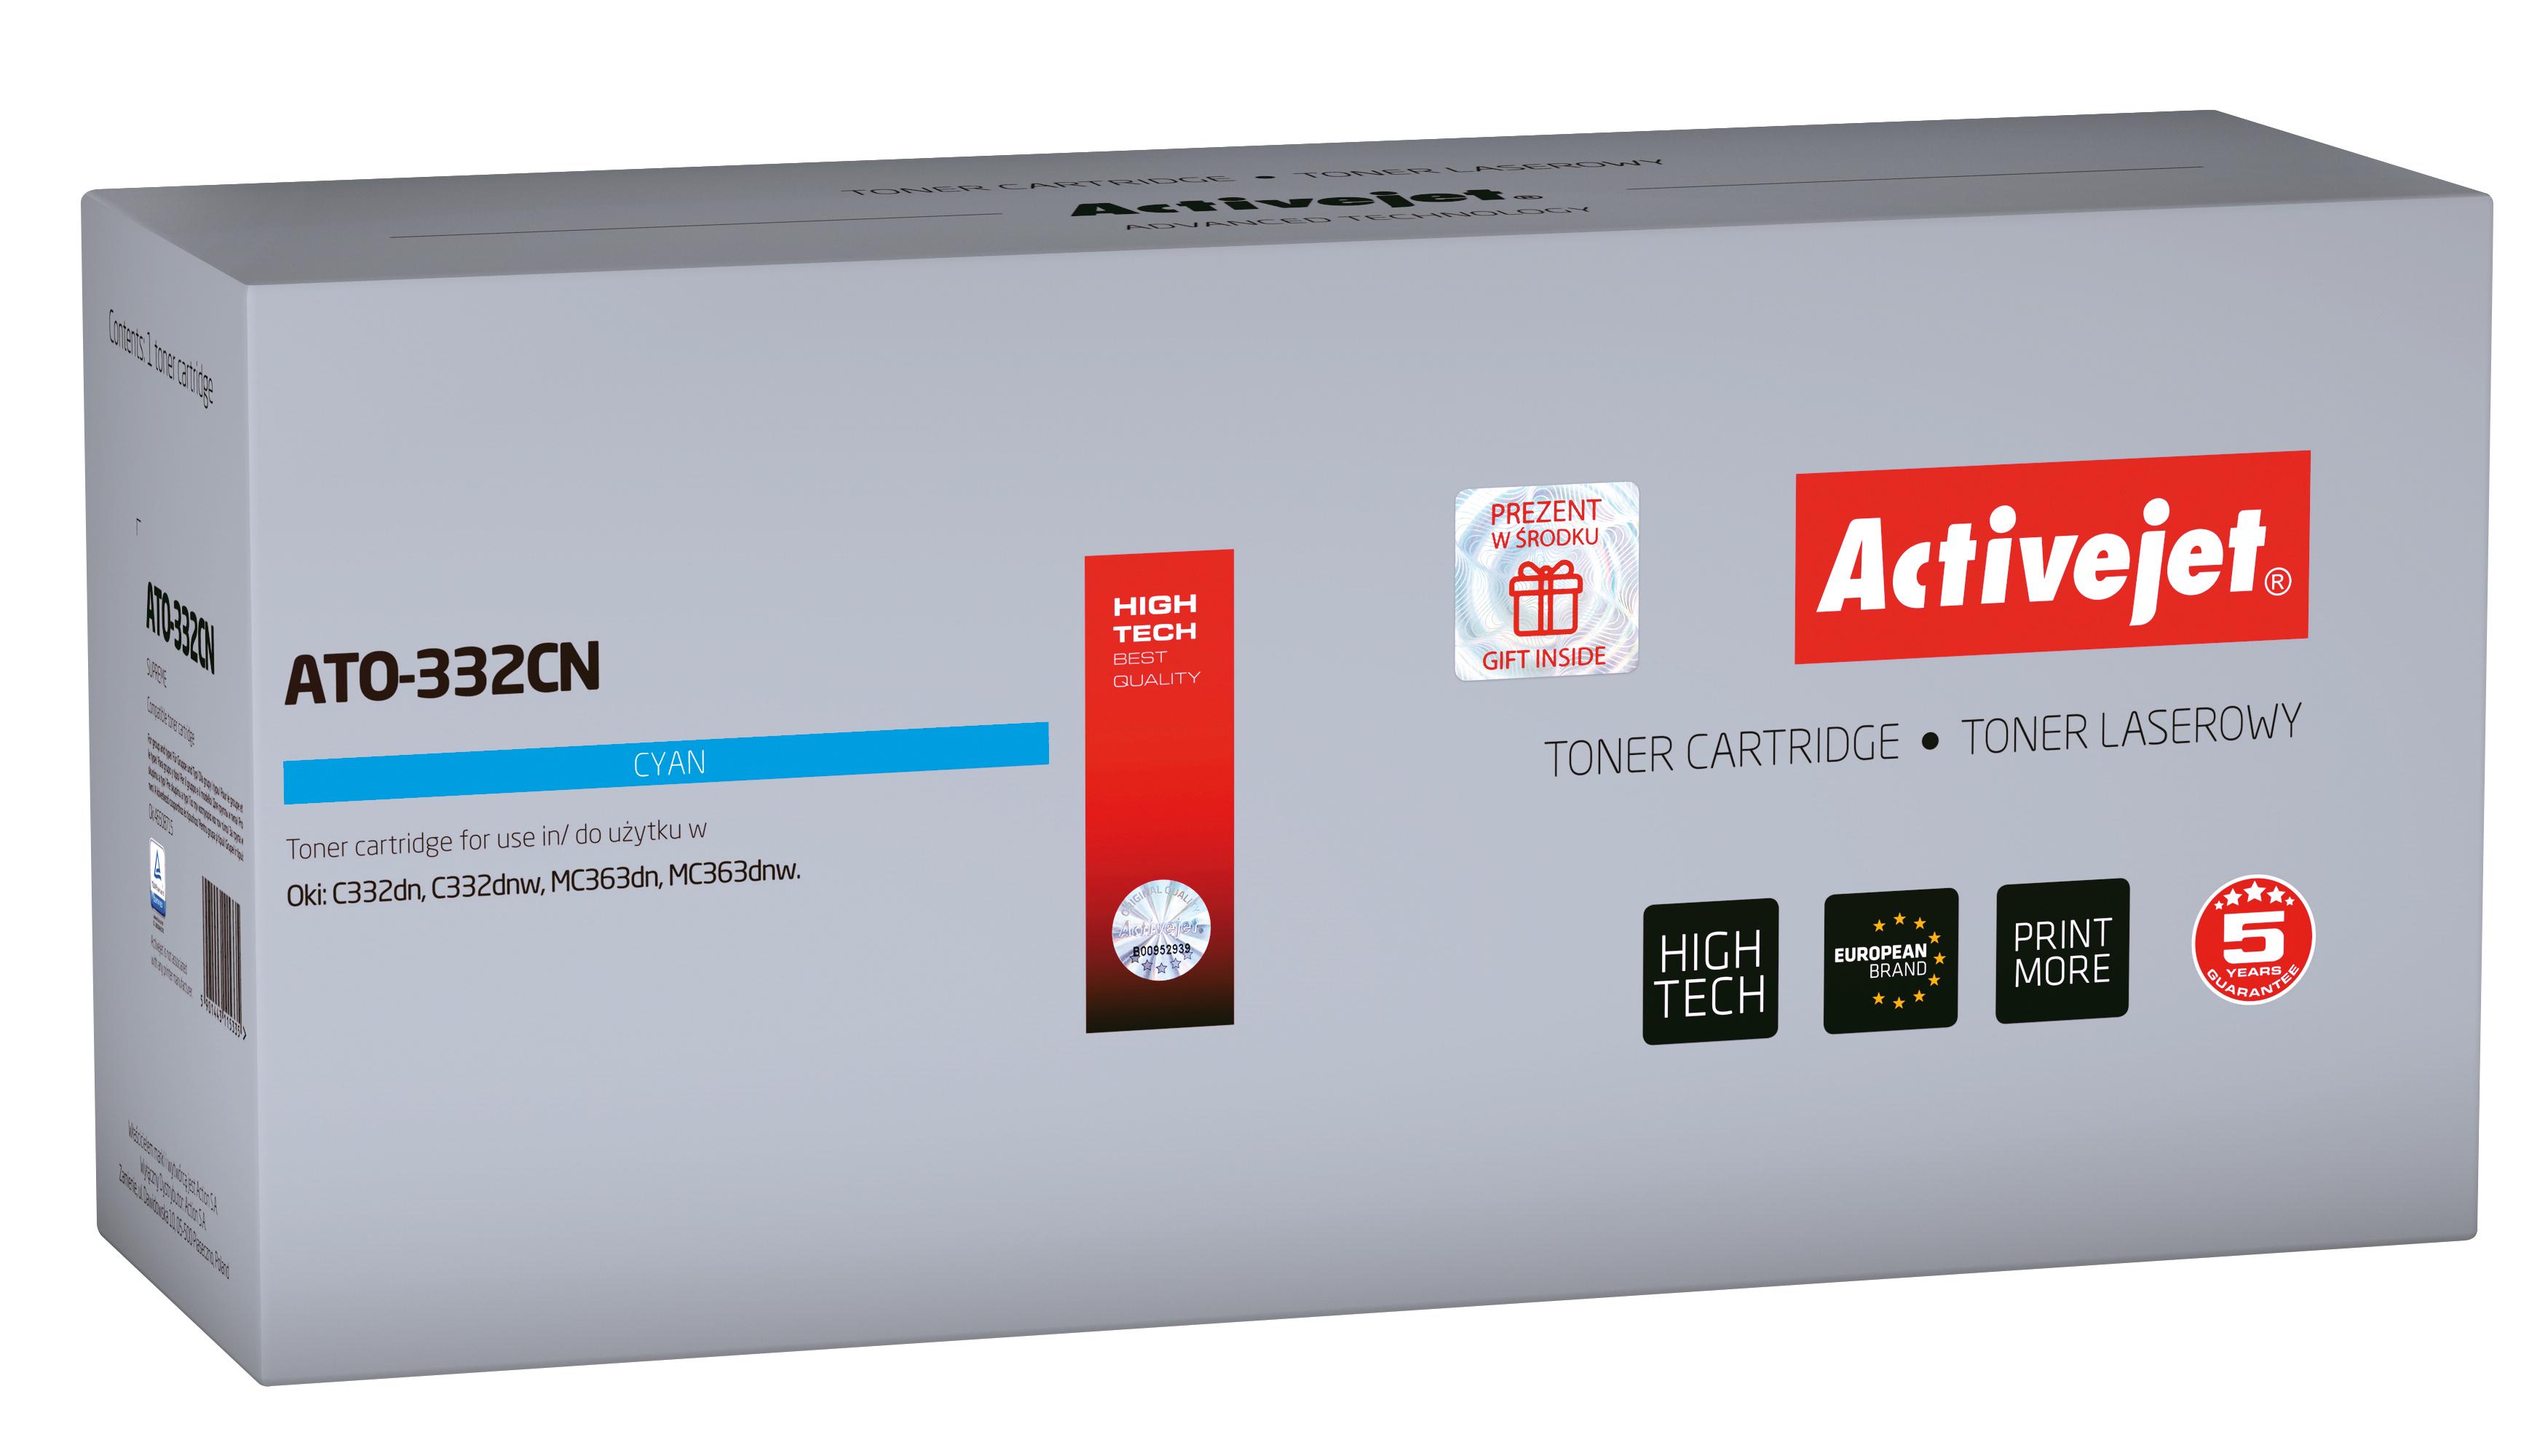 Toner Activejet  ATO-332CN do drukarki OKI, Zamiennik OKI 46508715; Supreme; 1500 stron; Błękitny.